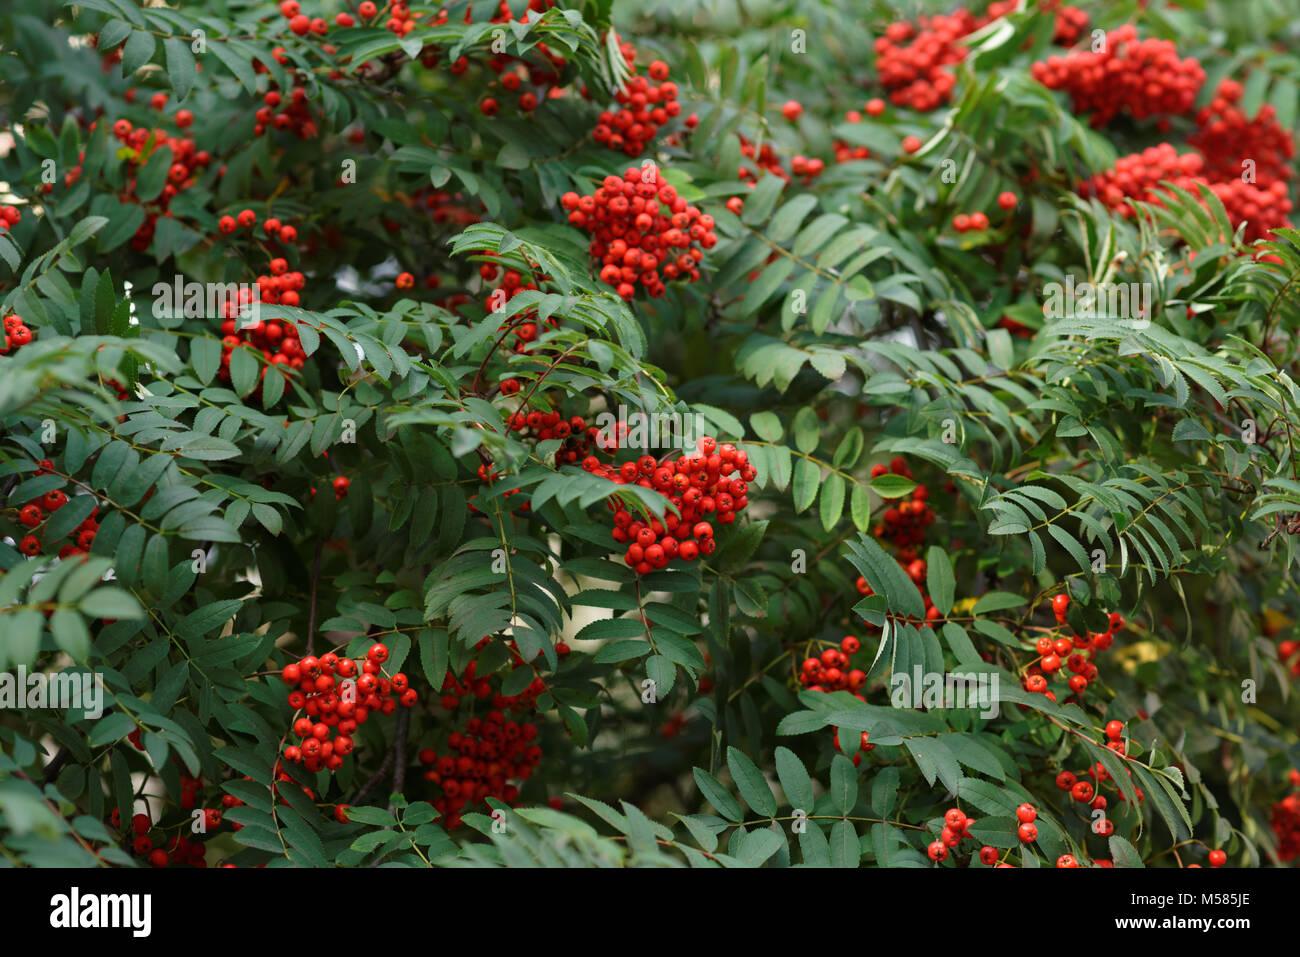 Mountain-ash fruits in lush foliage - Stock Image